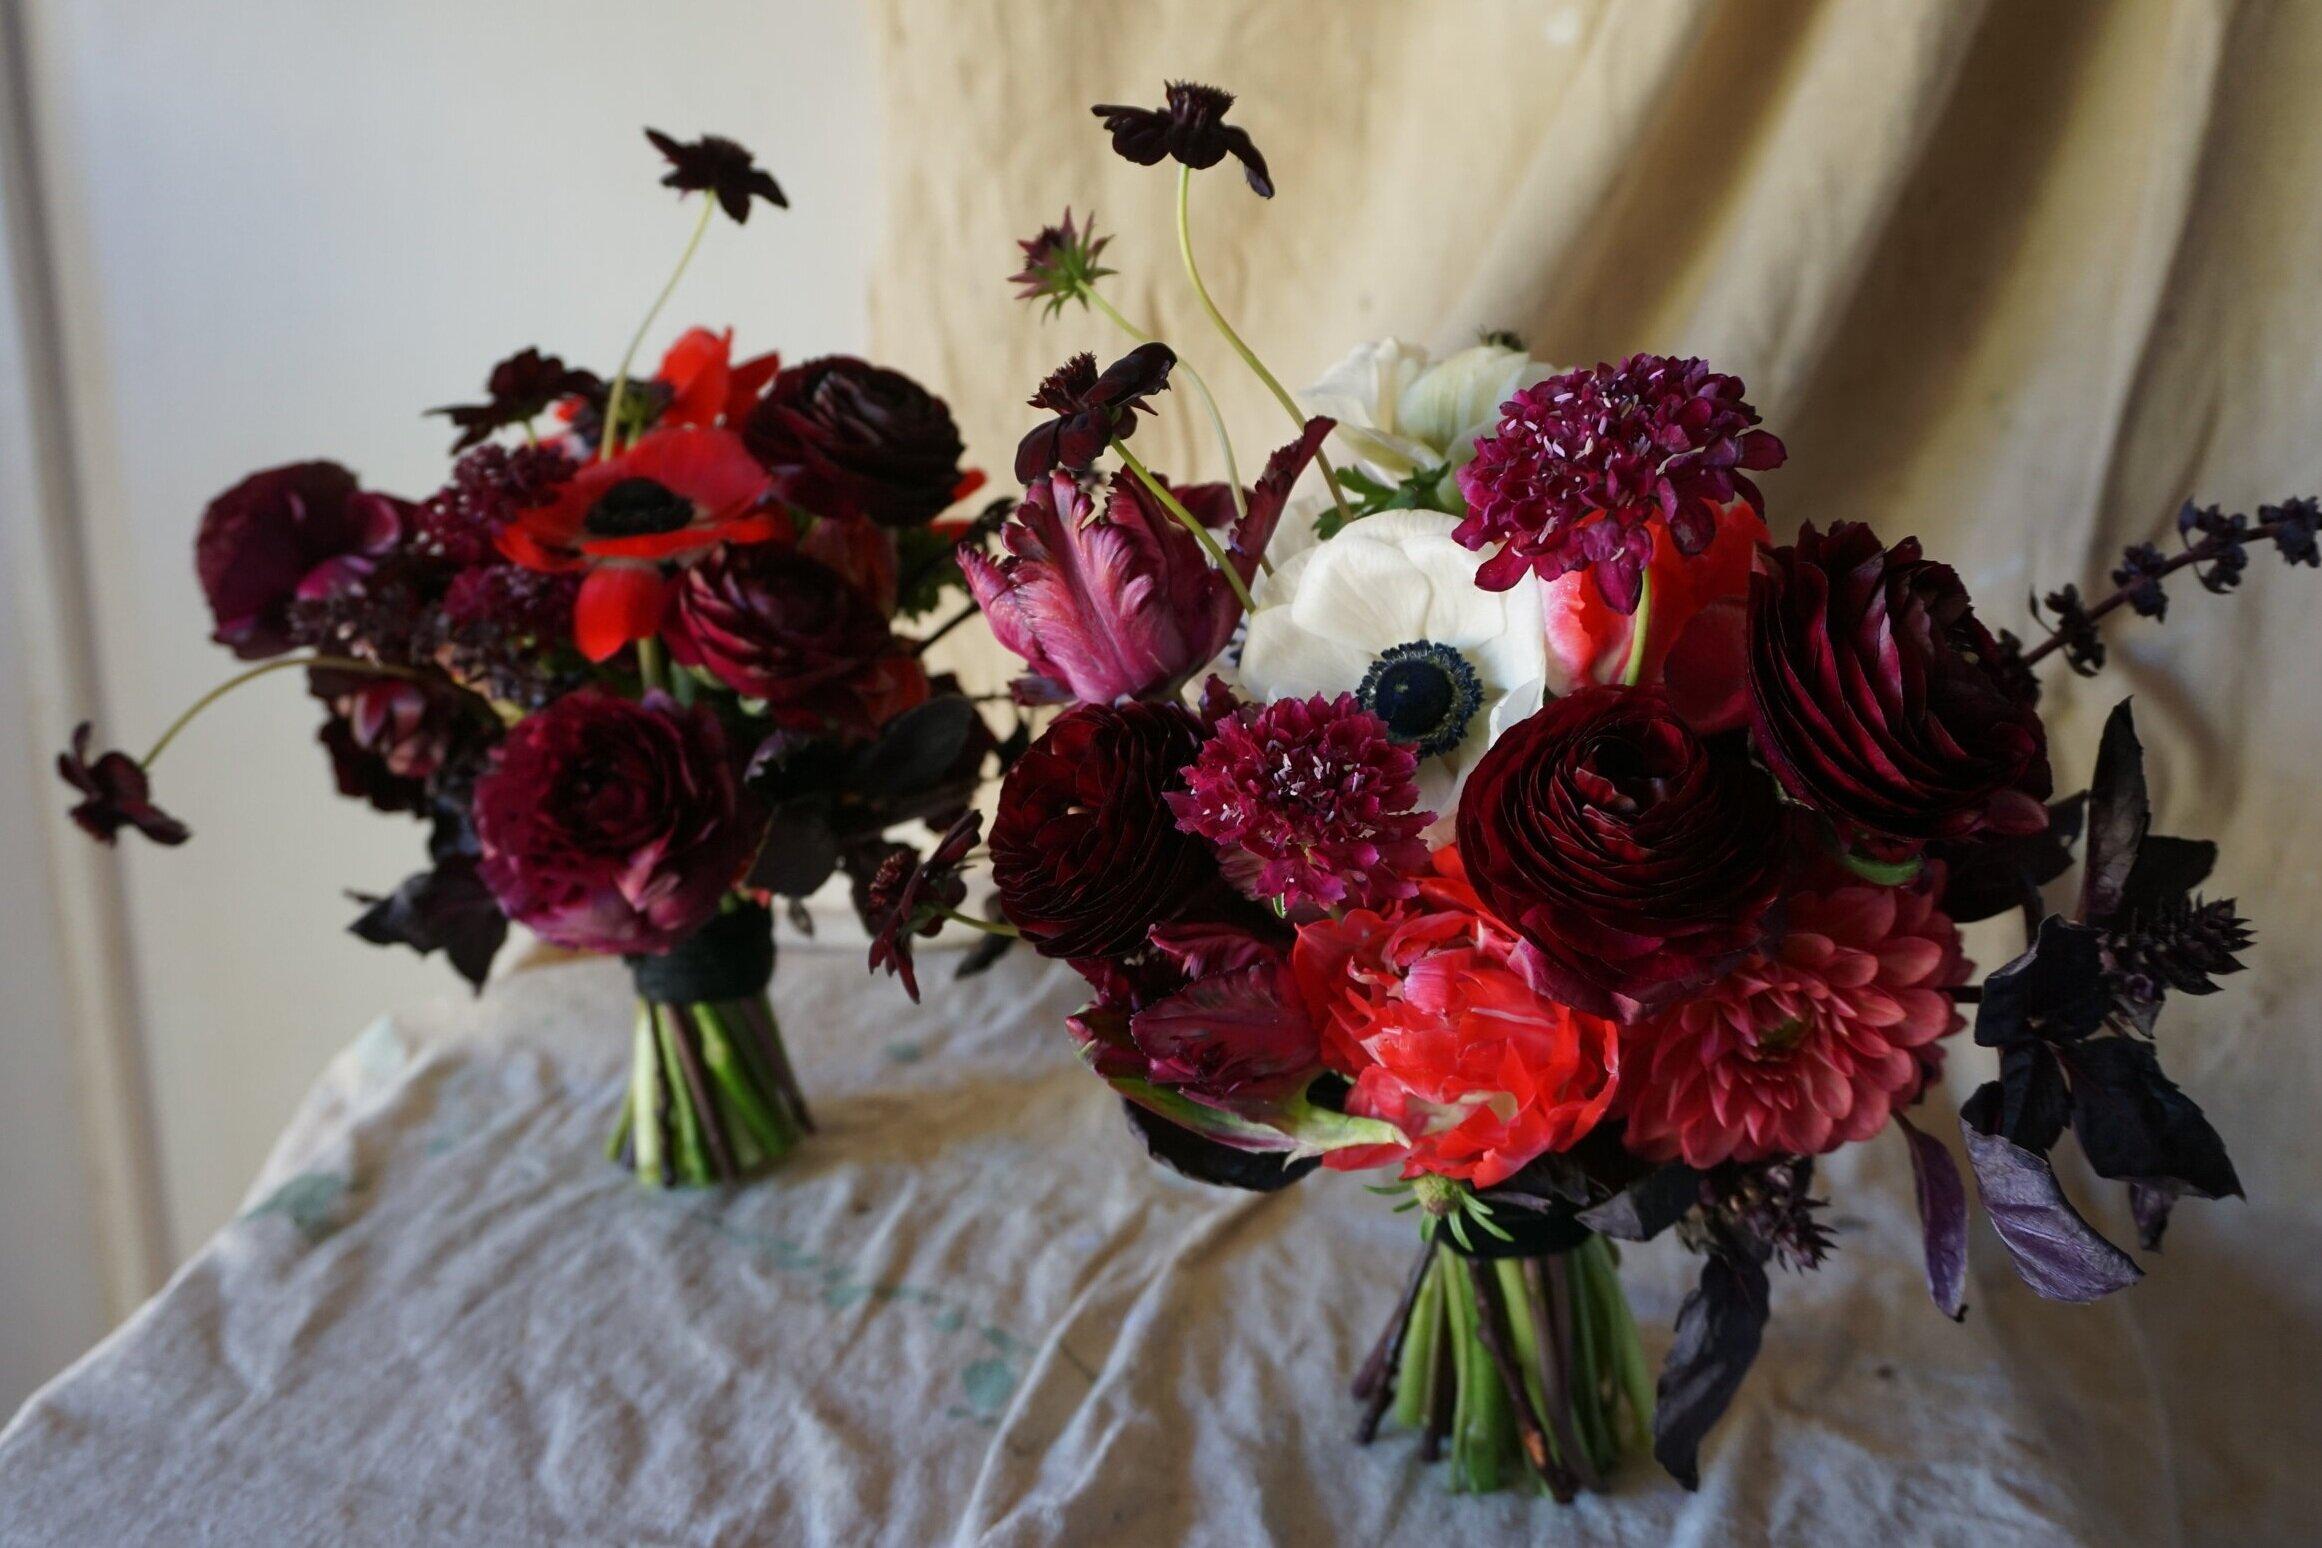 Botanicamuse by Madeleine Shelton San Diego Wedding event designer florist  Dutch Masters P Salter Farms Wayward Daisy The Guild